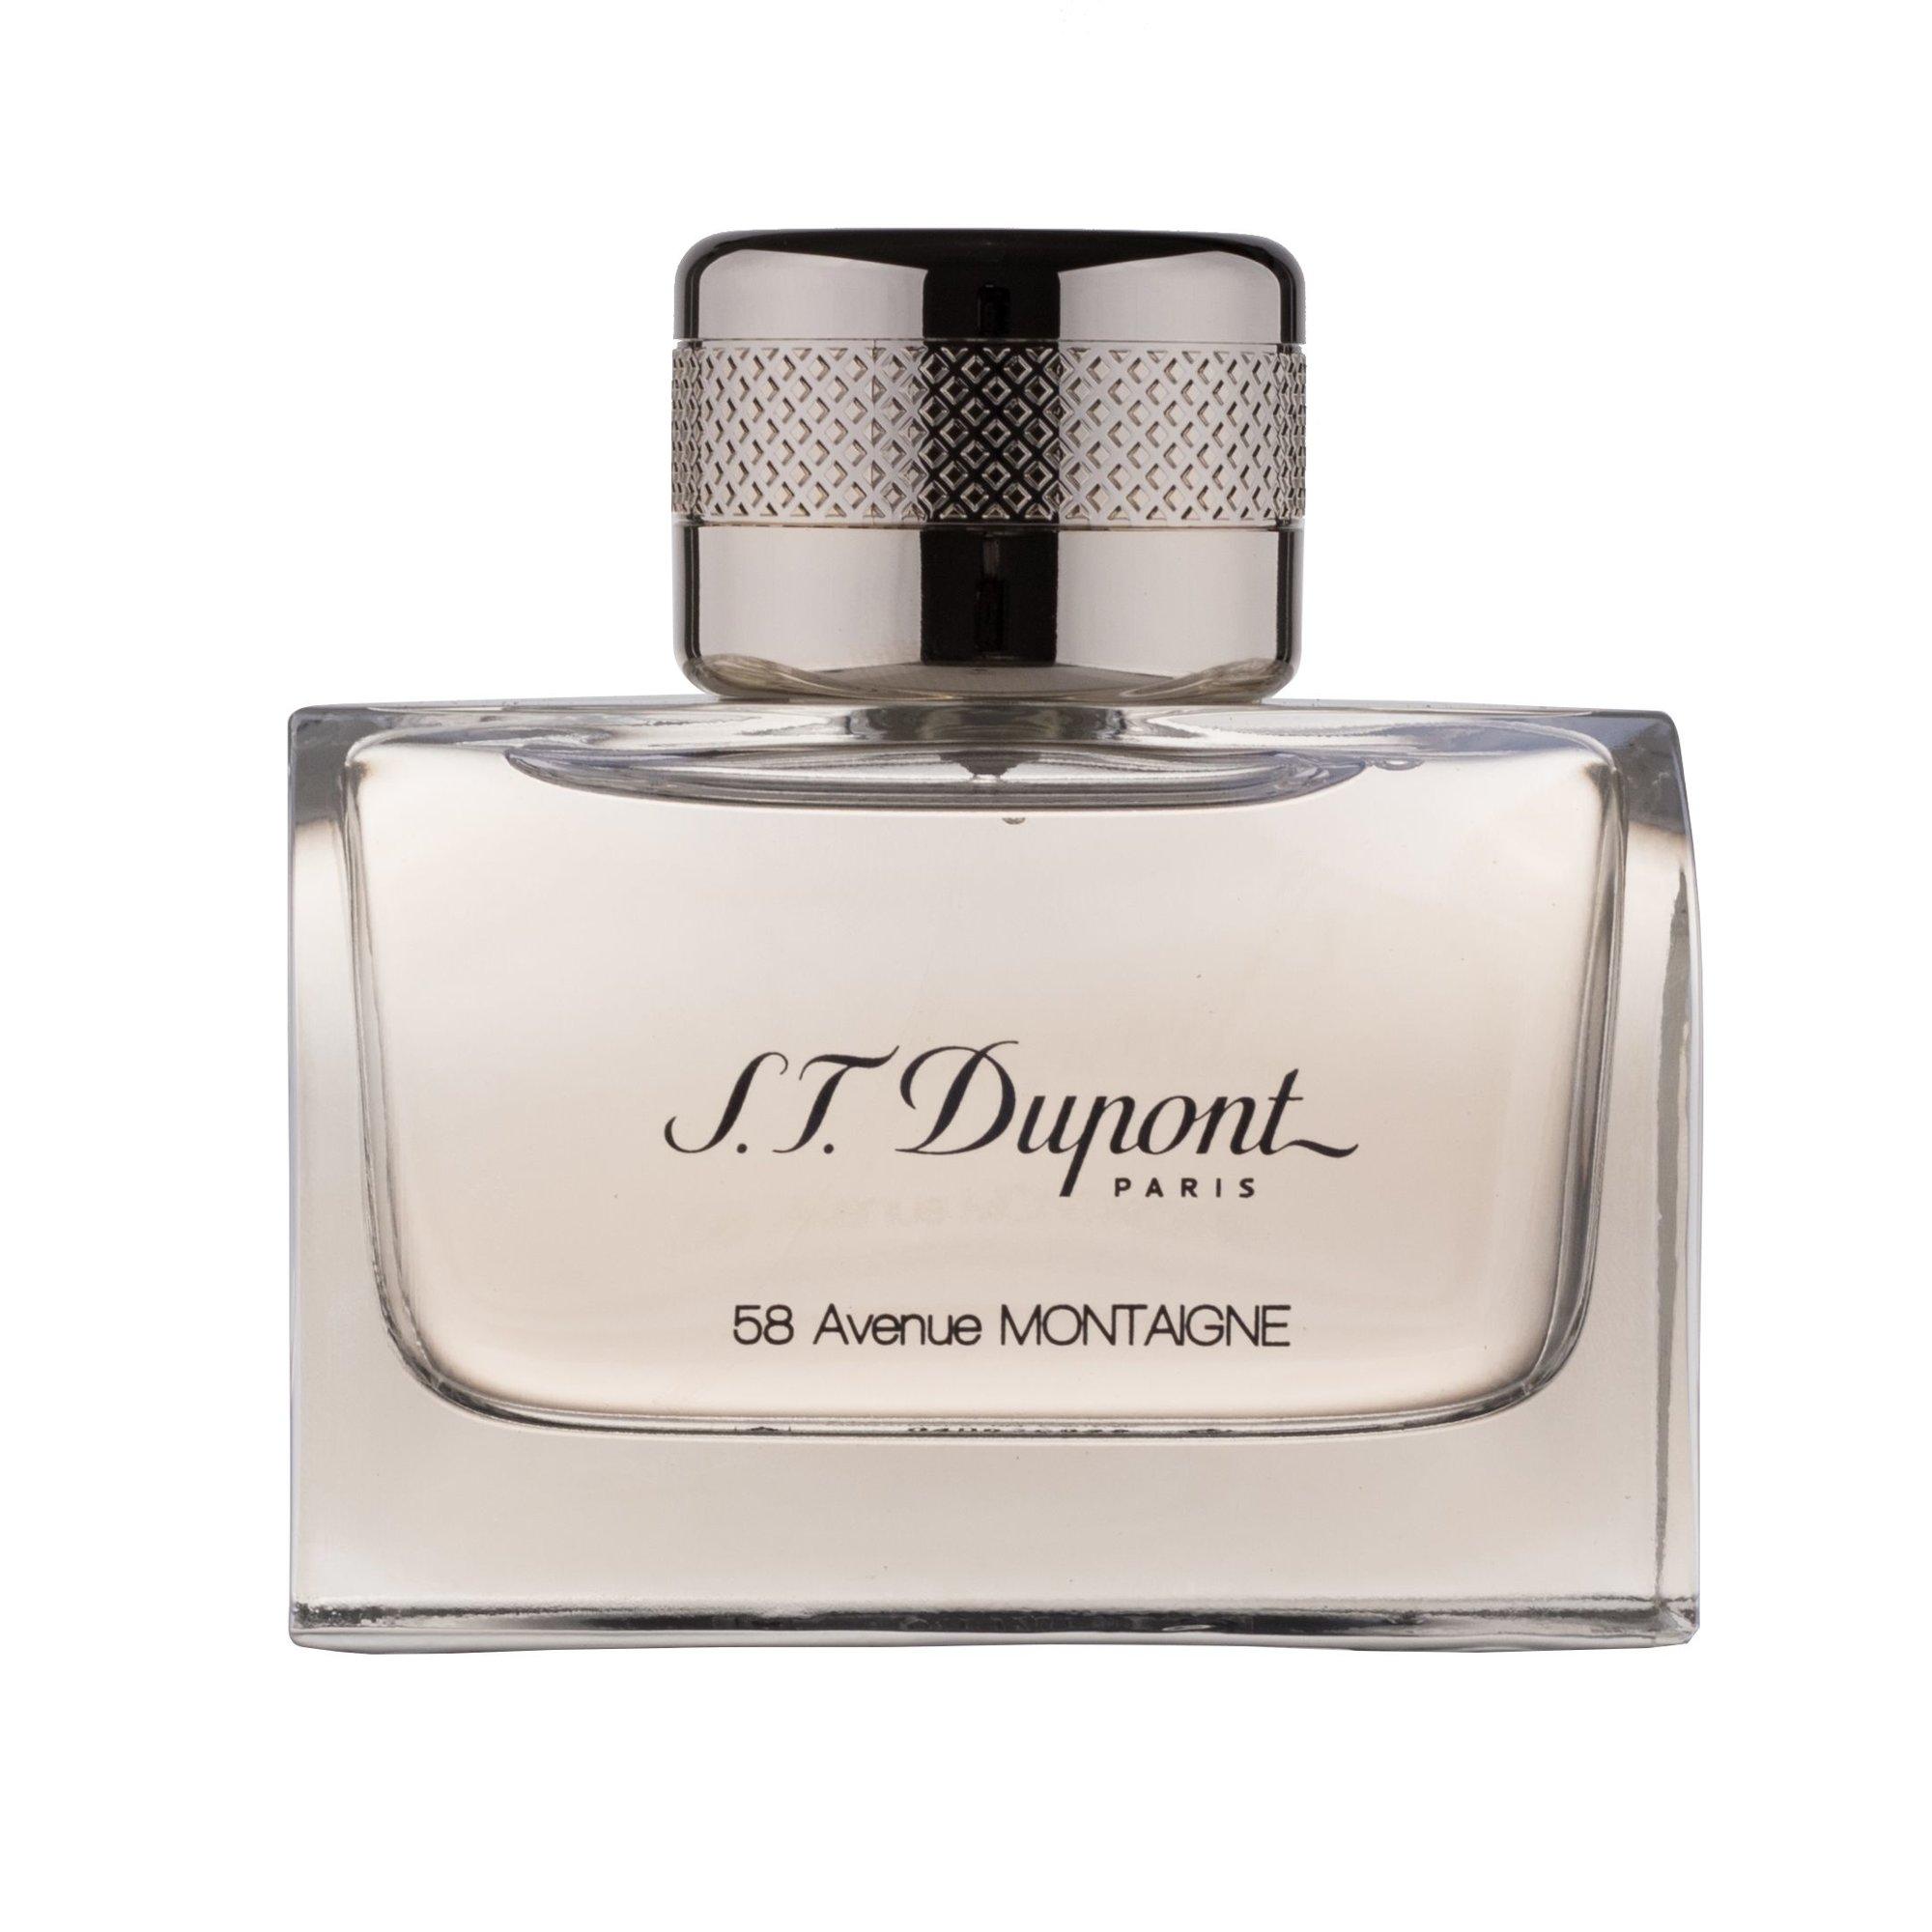 S.T. Dupont 58 Avenue Montaigne EDP 50ml